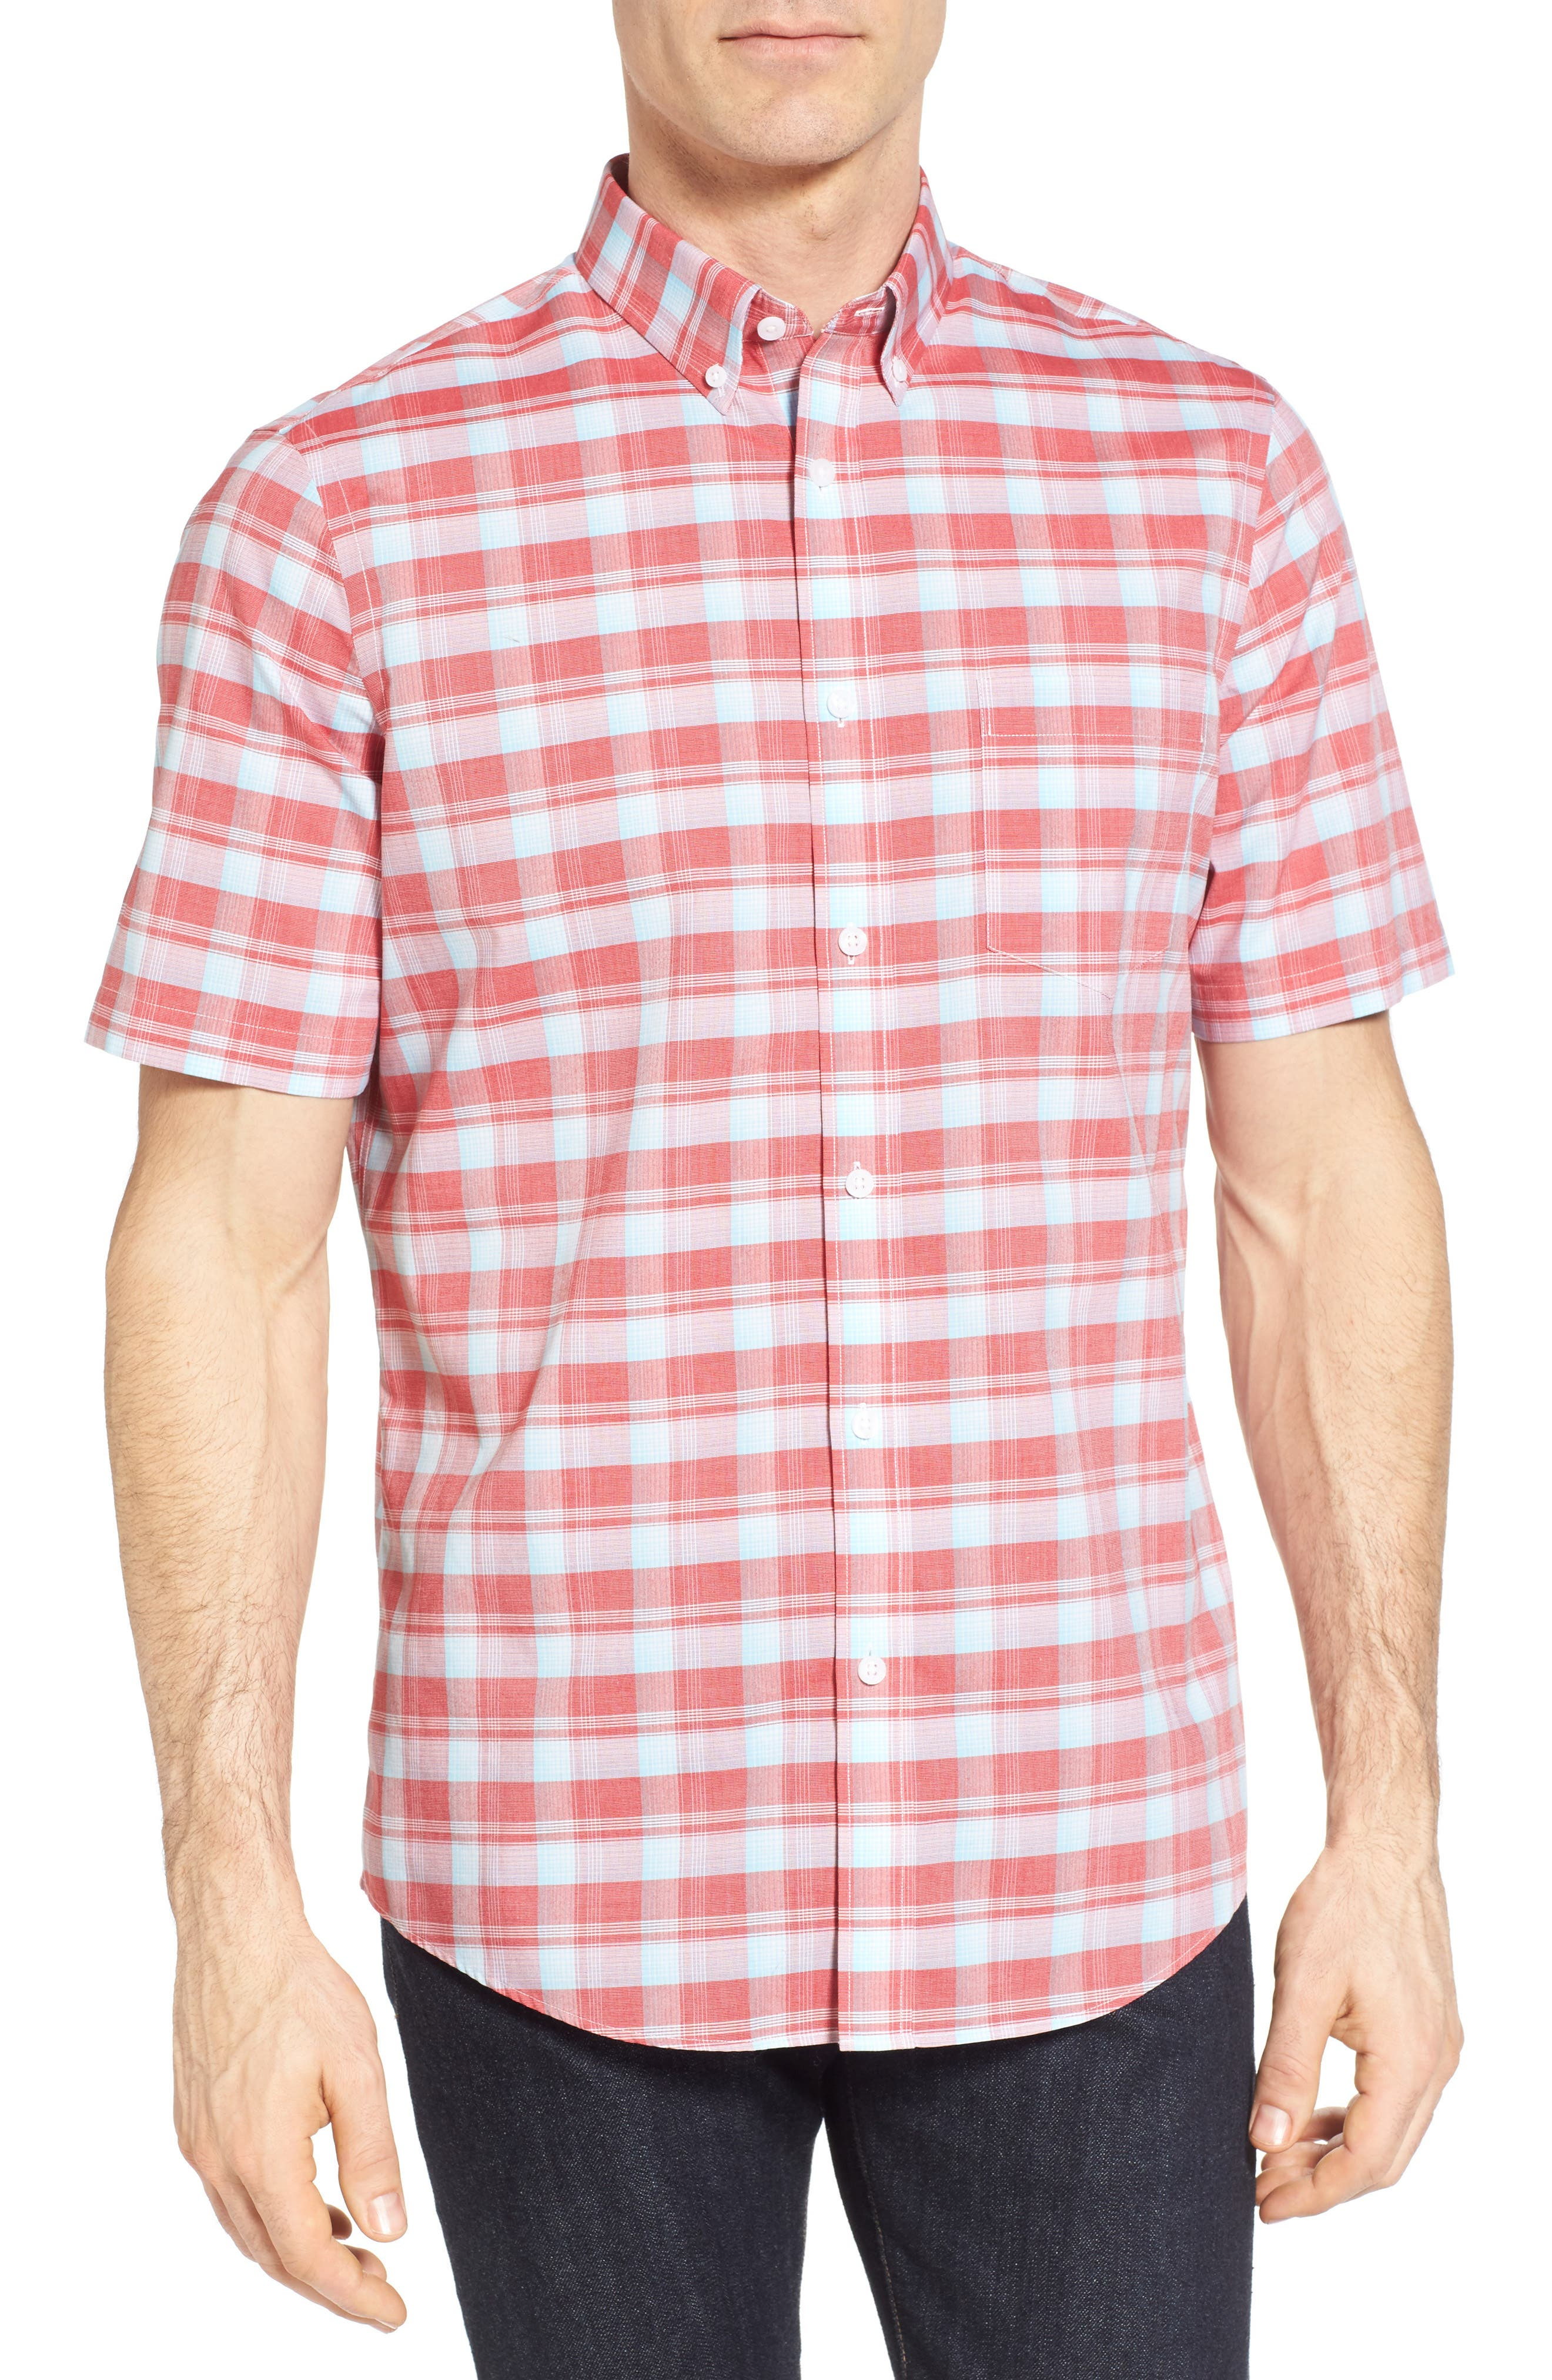 Regular Fit Plaid Sport Shirt,                         Main,                         color, Red Pompeii Blue Check